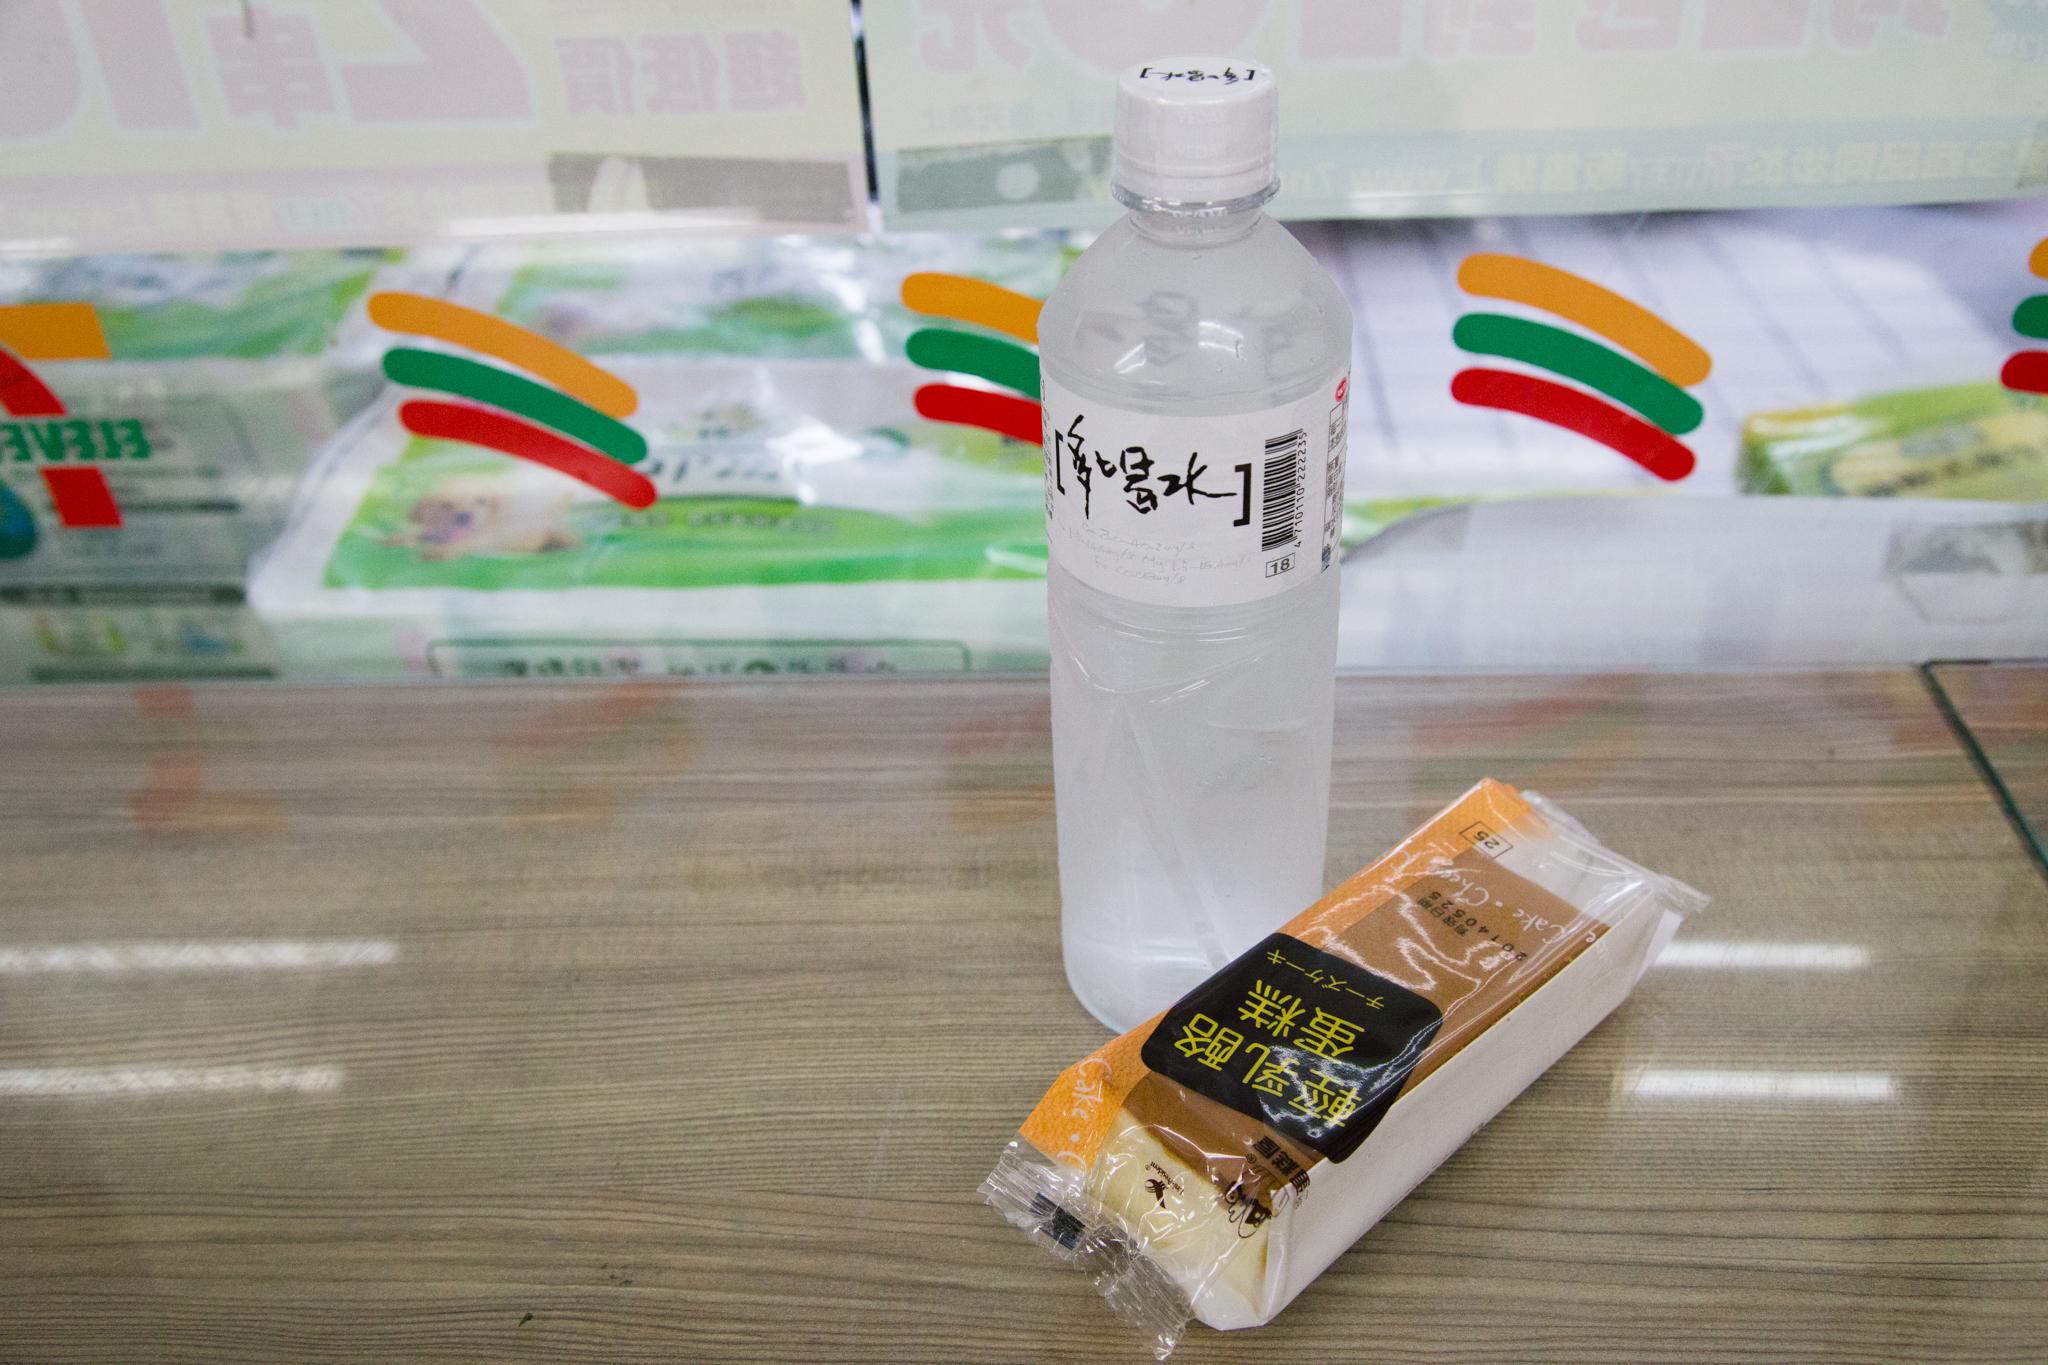 snack break 40NT = $1.25